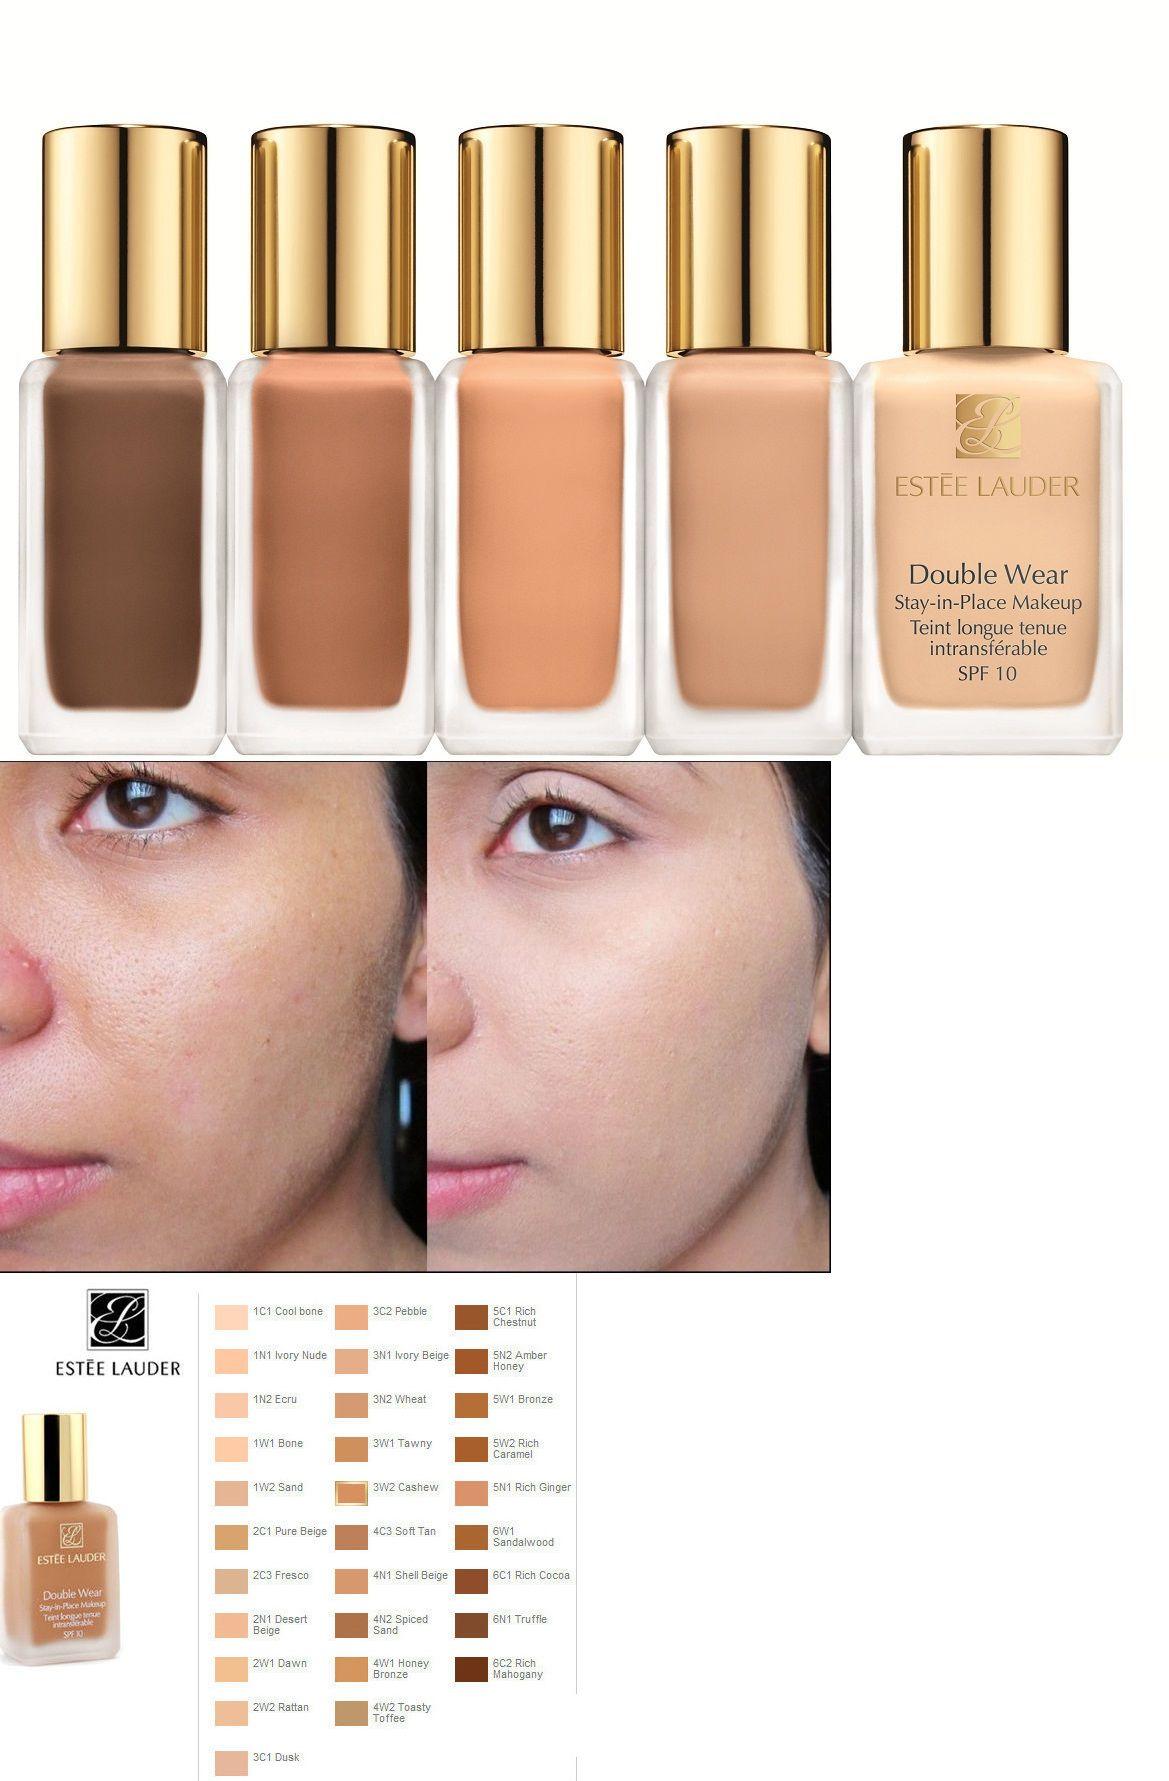 Foundation Estee Lauder Double Wear StayInPlace Makeup